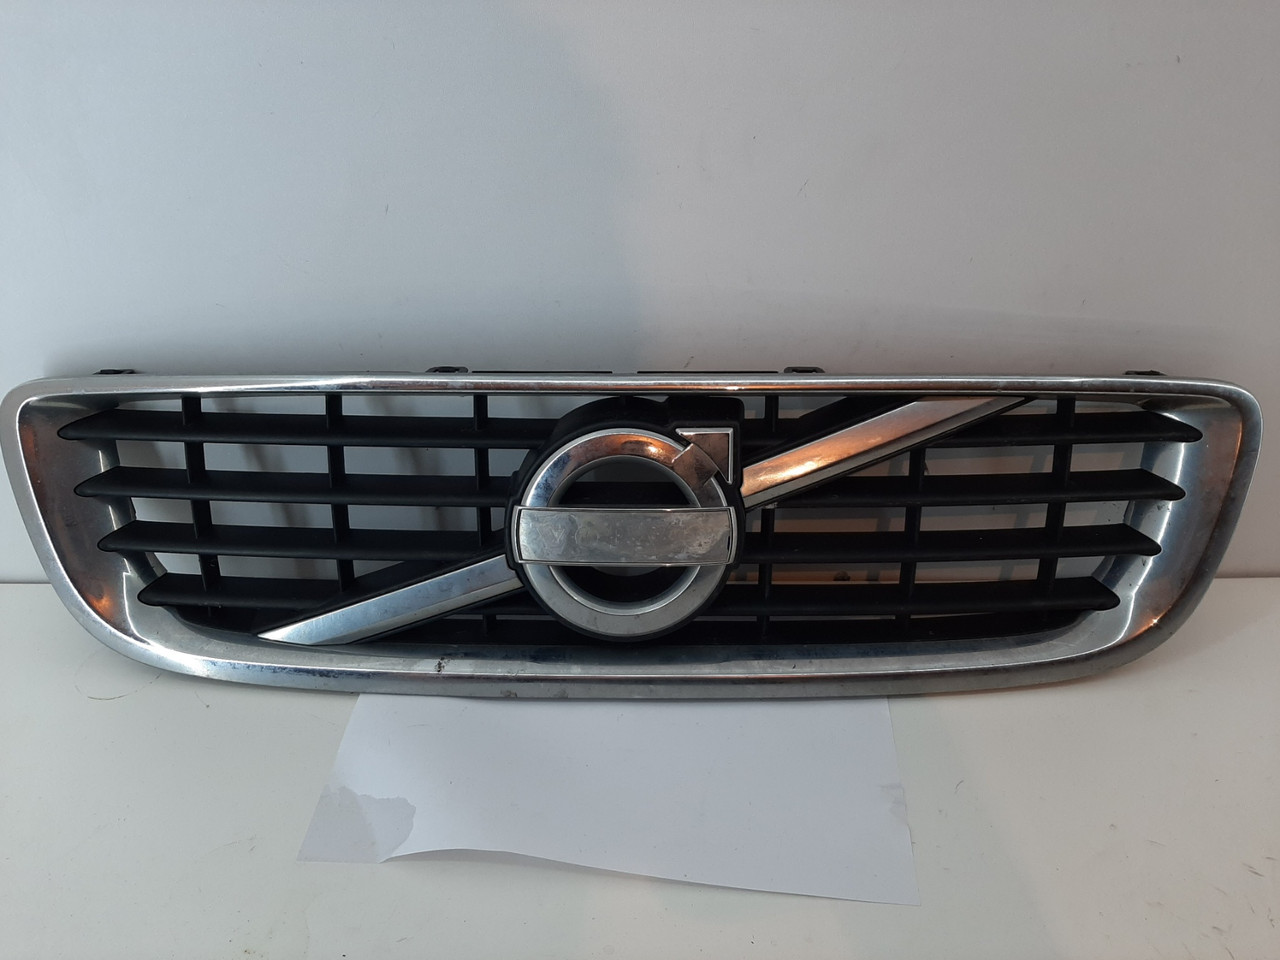 Решетка Volvo S40 V50 2011 гг 31290757